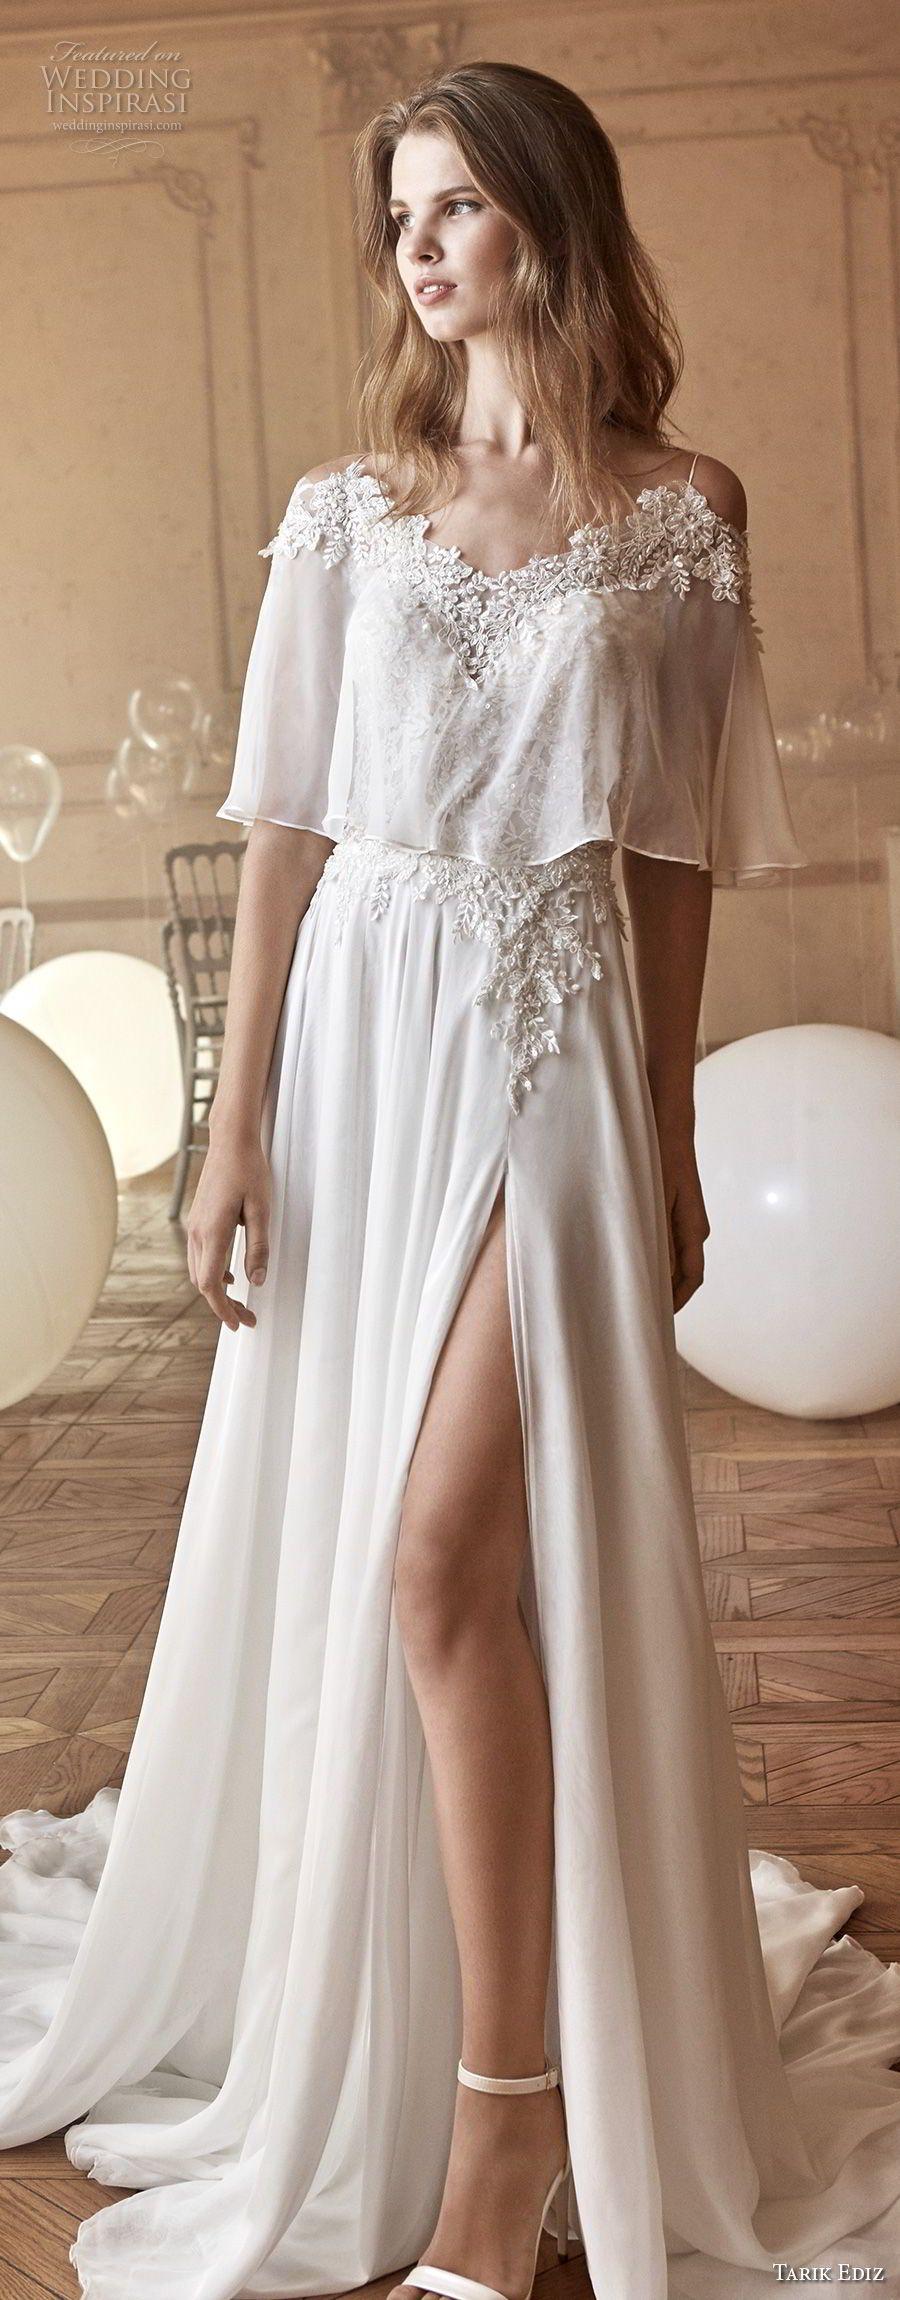 Lace wedding dress tulle november 2018 Tarik Ediz White  Wedding Dresses  Slit skirt Chapel train and